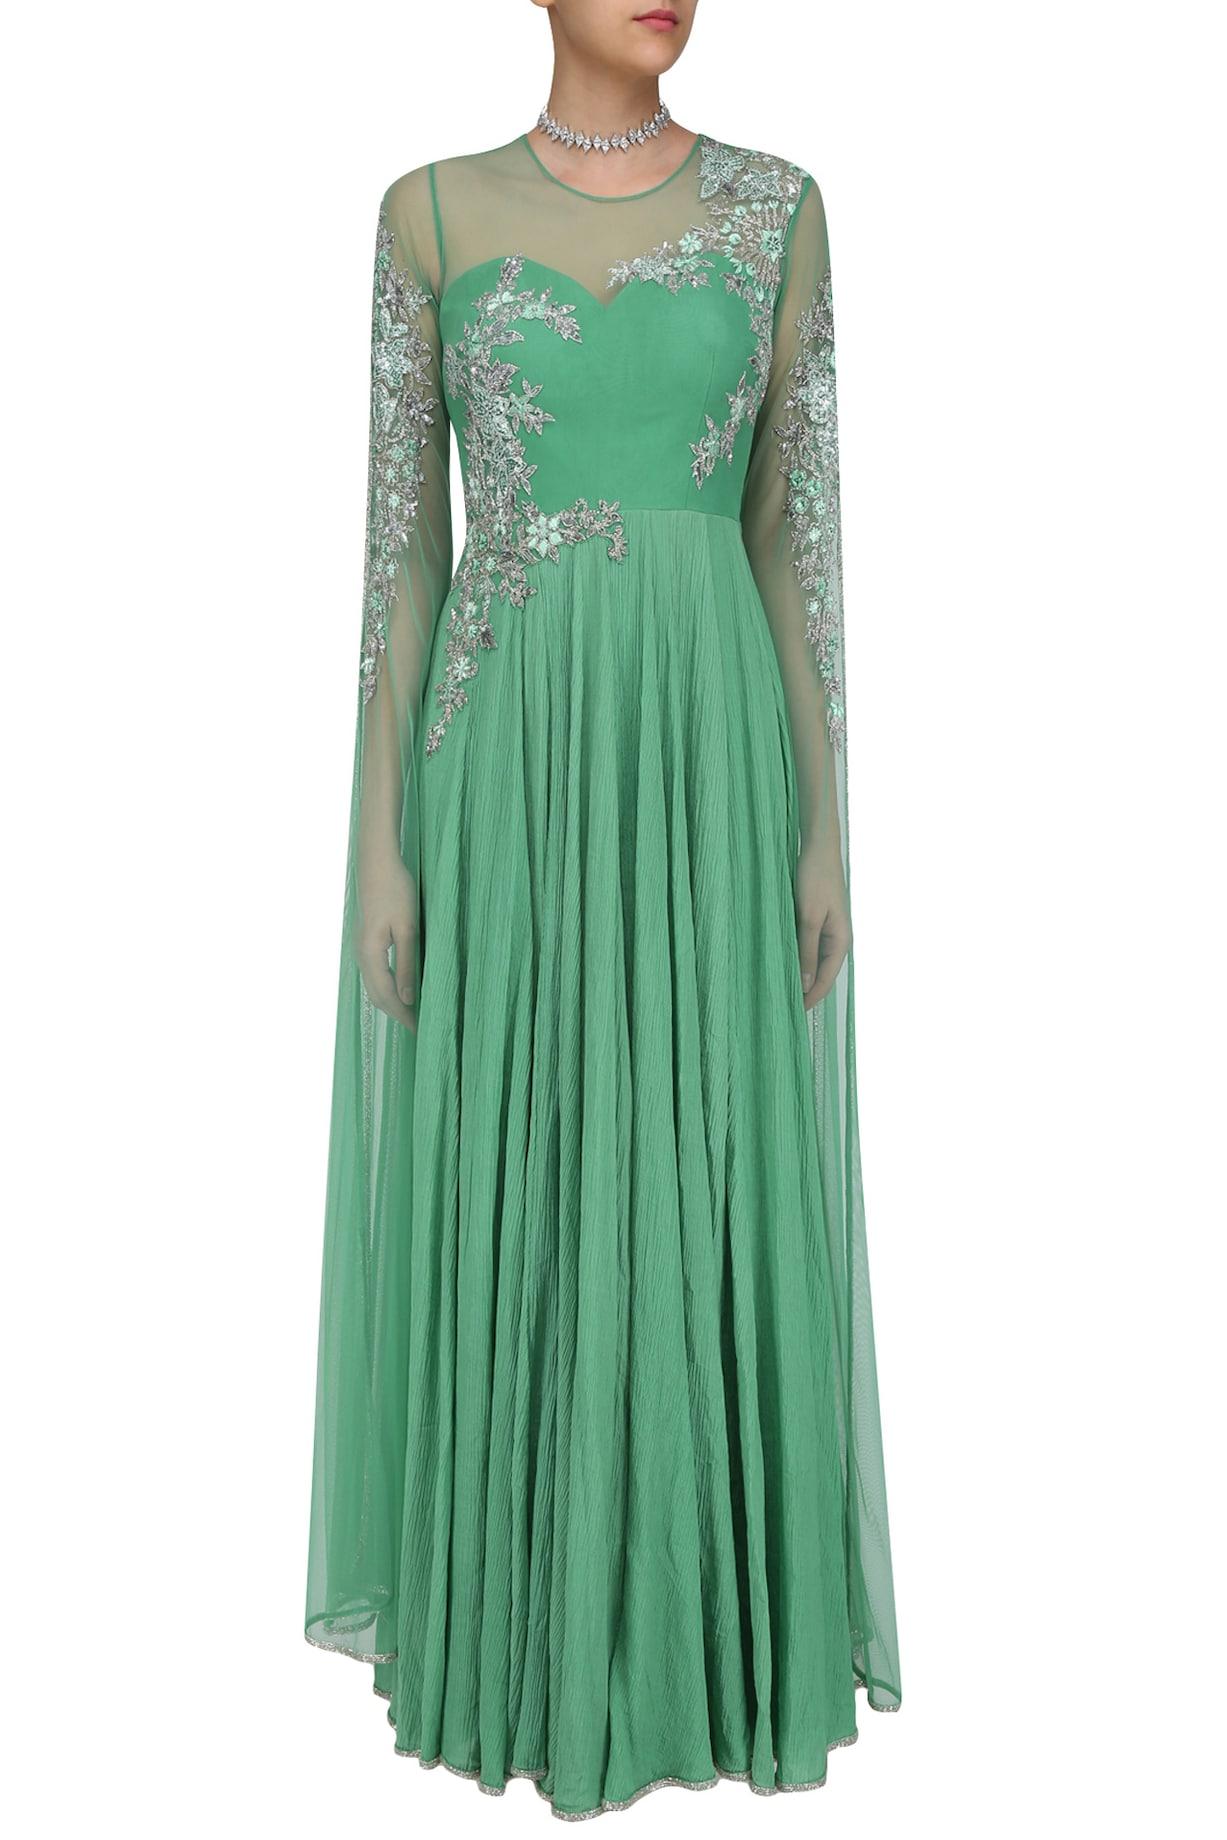 Swapan & Seema Gowns